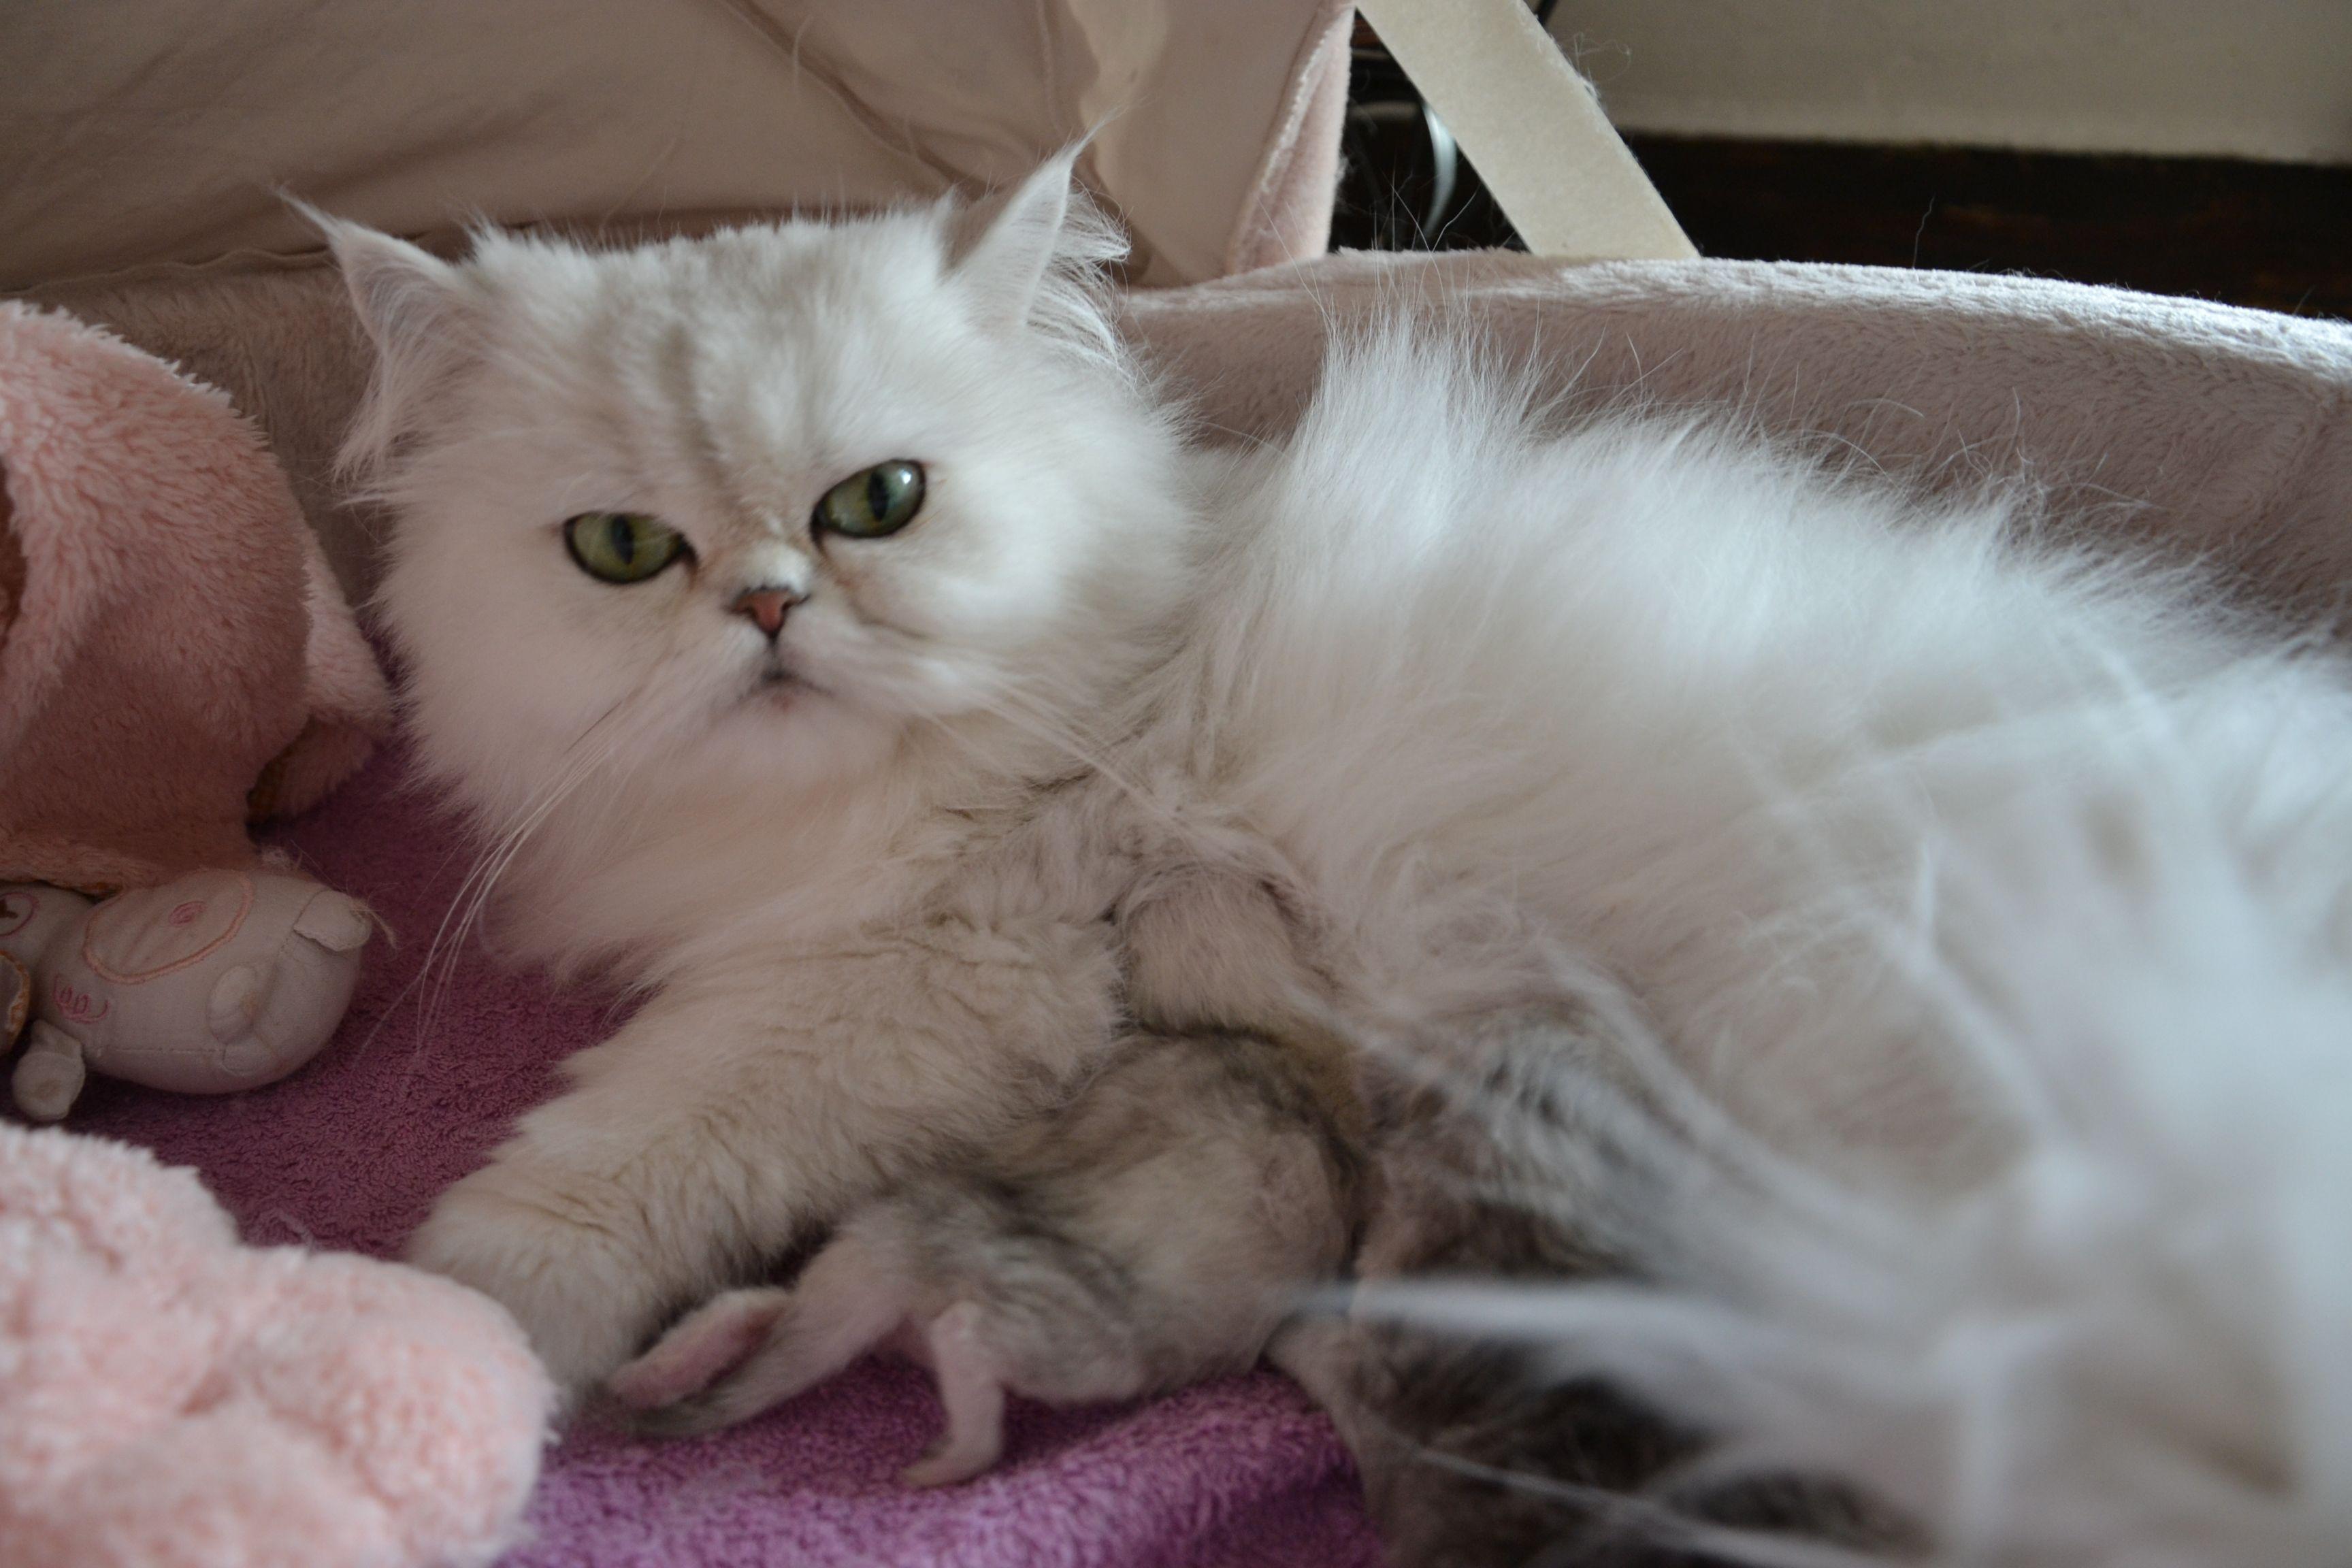 _Elyzabeth + chatons-5jours.jpg